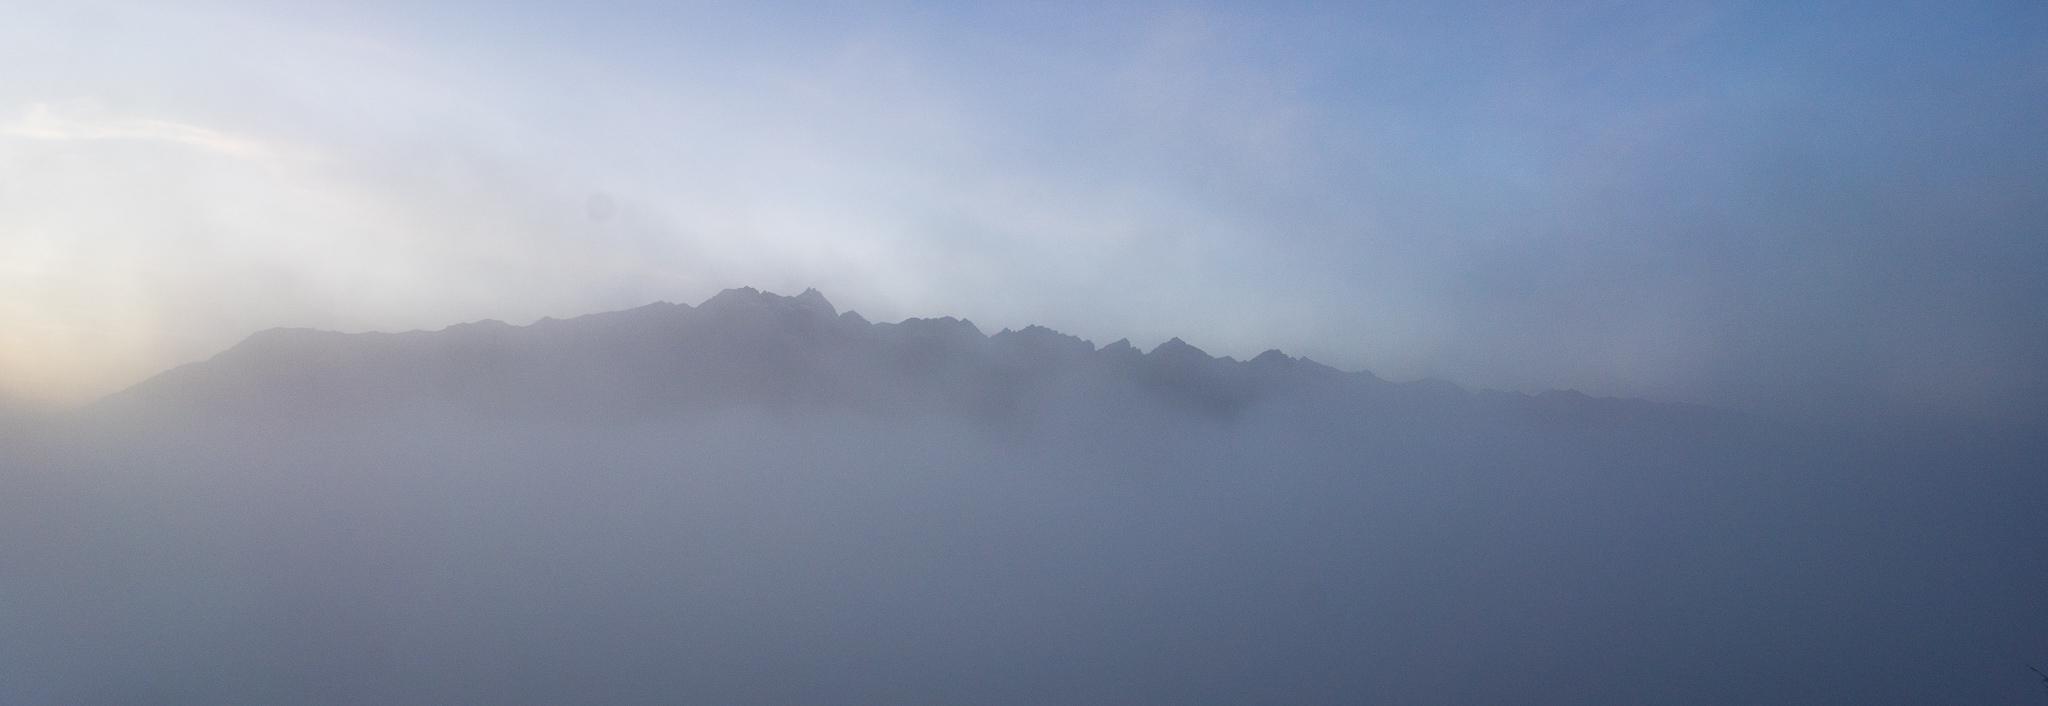 https://d2smswgns4xjfy.cloudfront.net/images/dsc07556.jpg